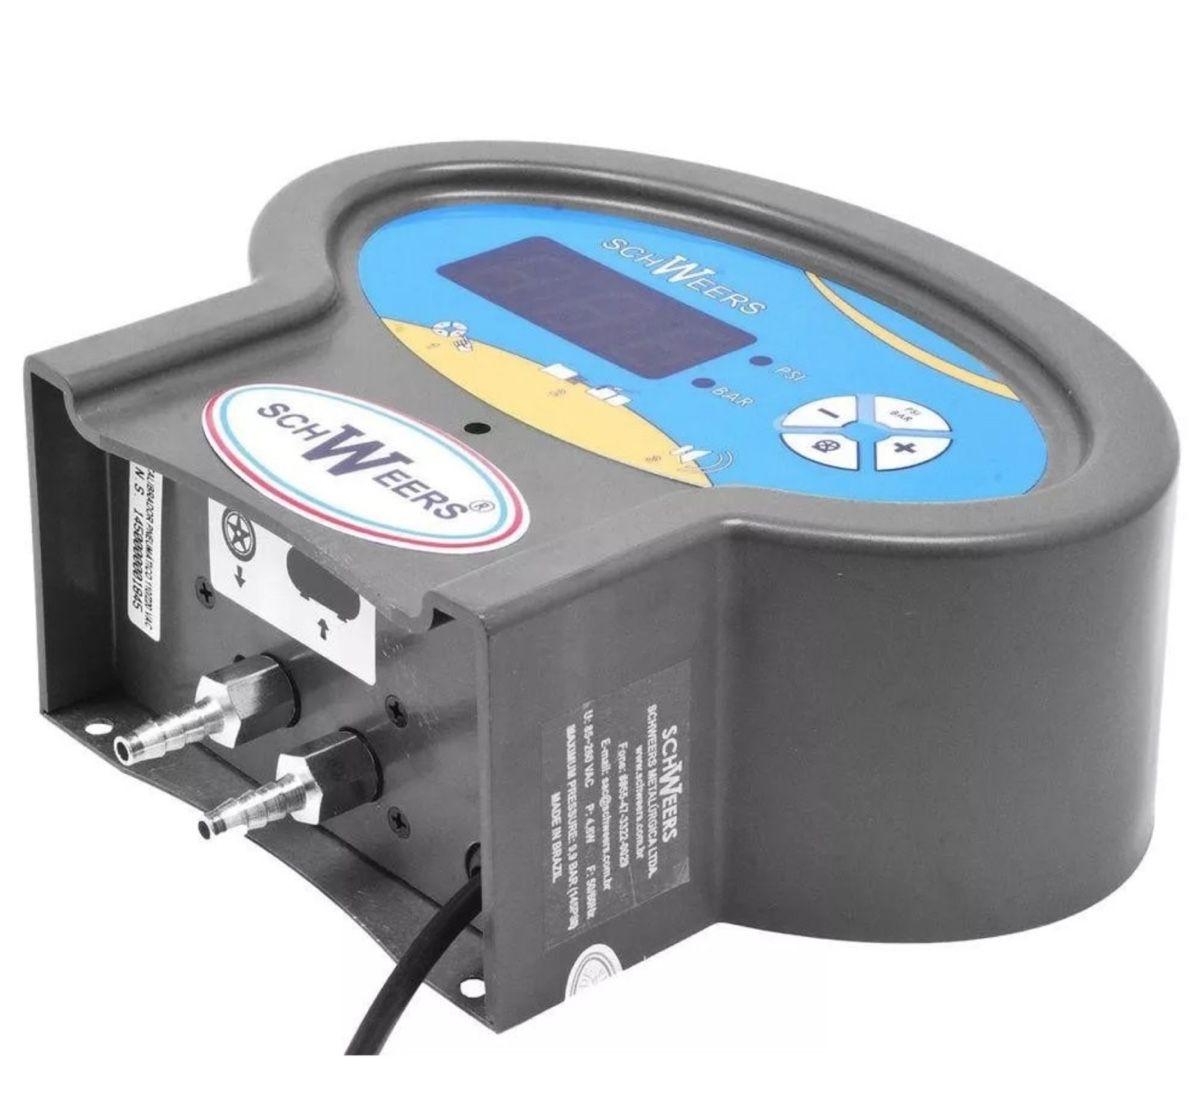 Calibrador Pneus Digital Schweers SCH-145 Box Bivolt